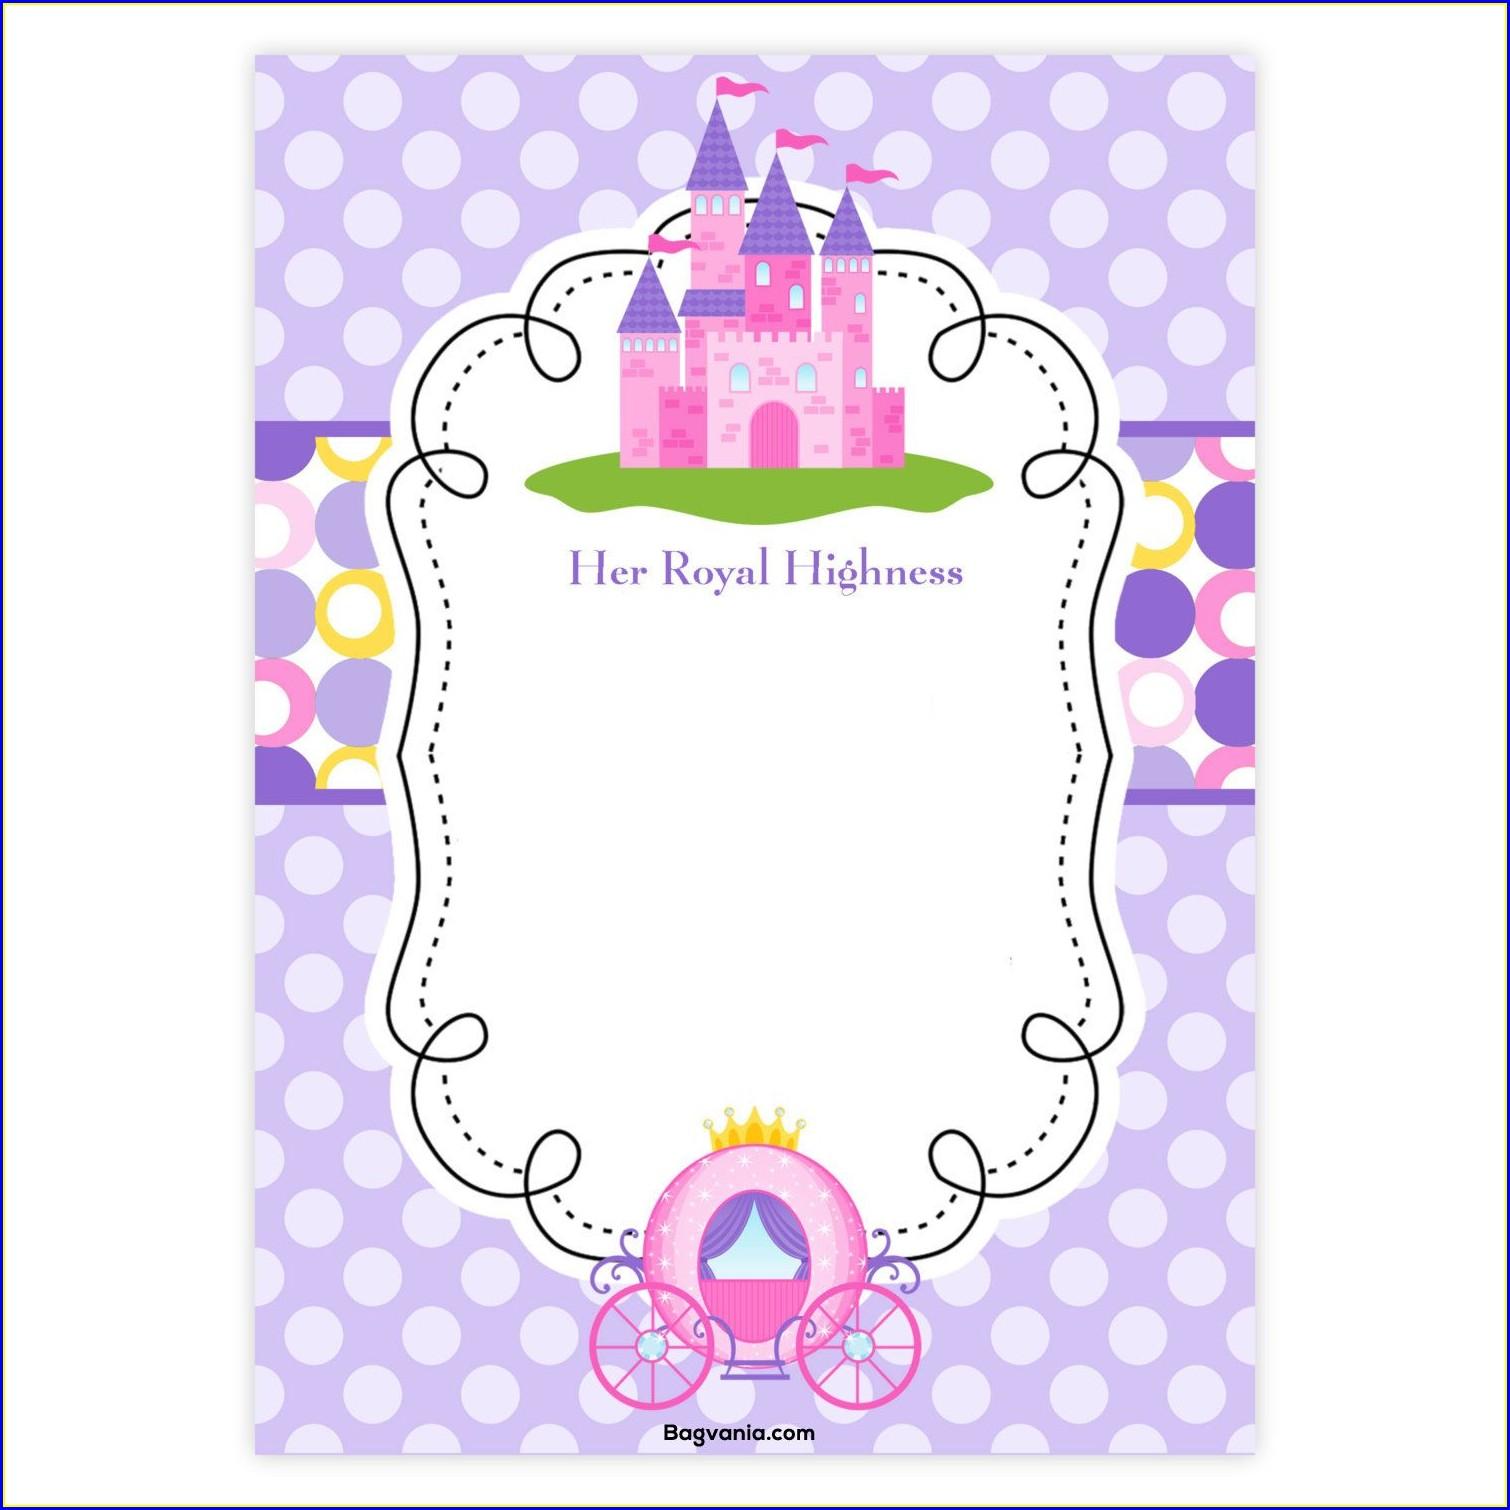 Downloadable Editable Princess Birthday Invitations